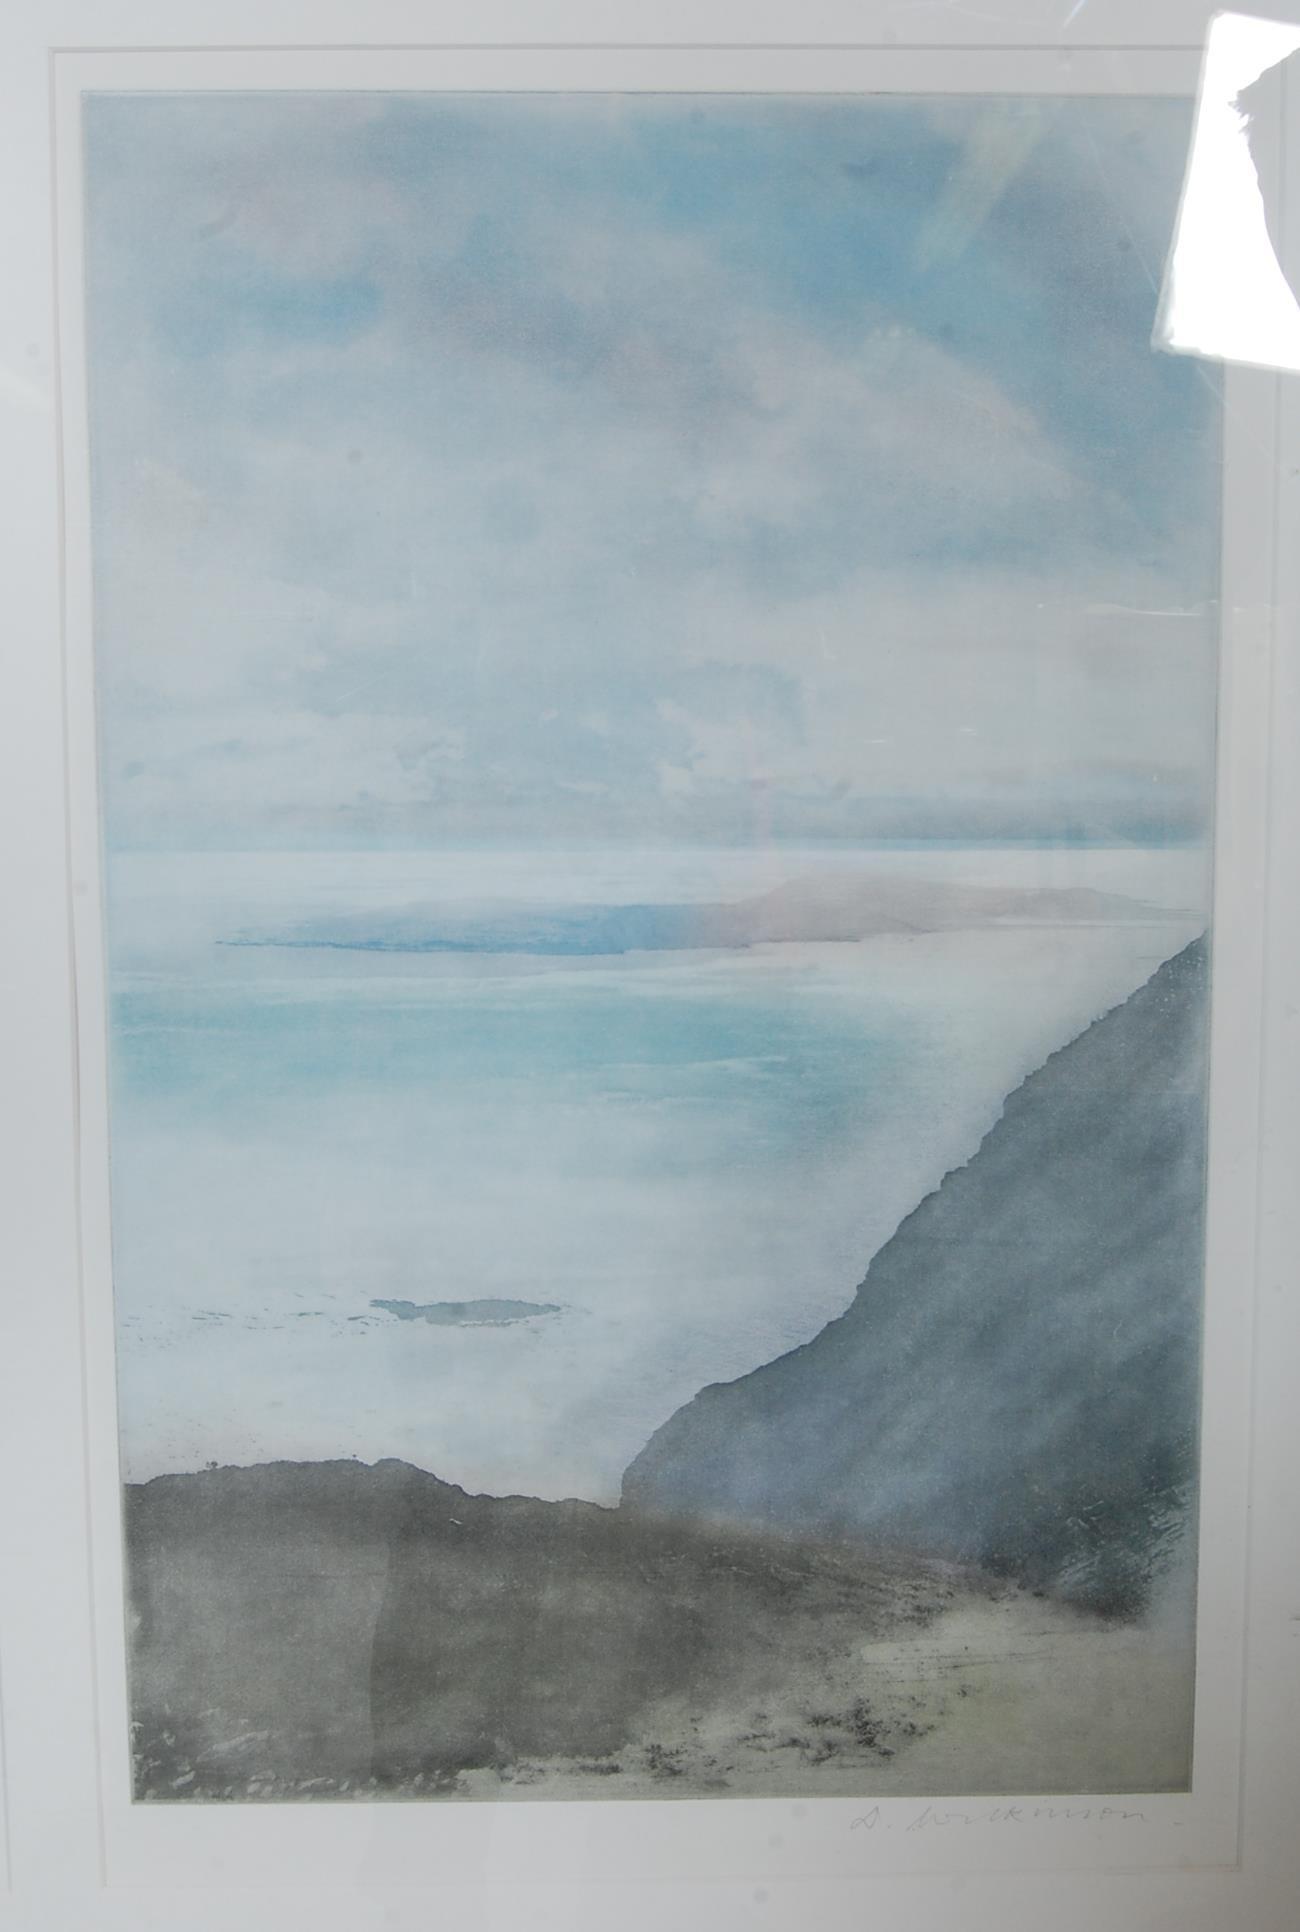 DEREK WILKINSON (BRITISH 1921-2001) 20TH CENTURY WATERCOLOUR SEASCAPE - Image 5 of 7